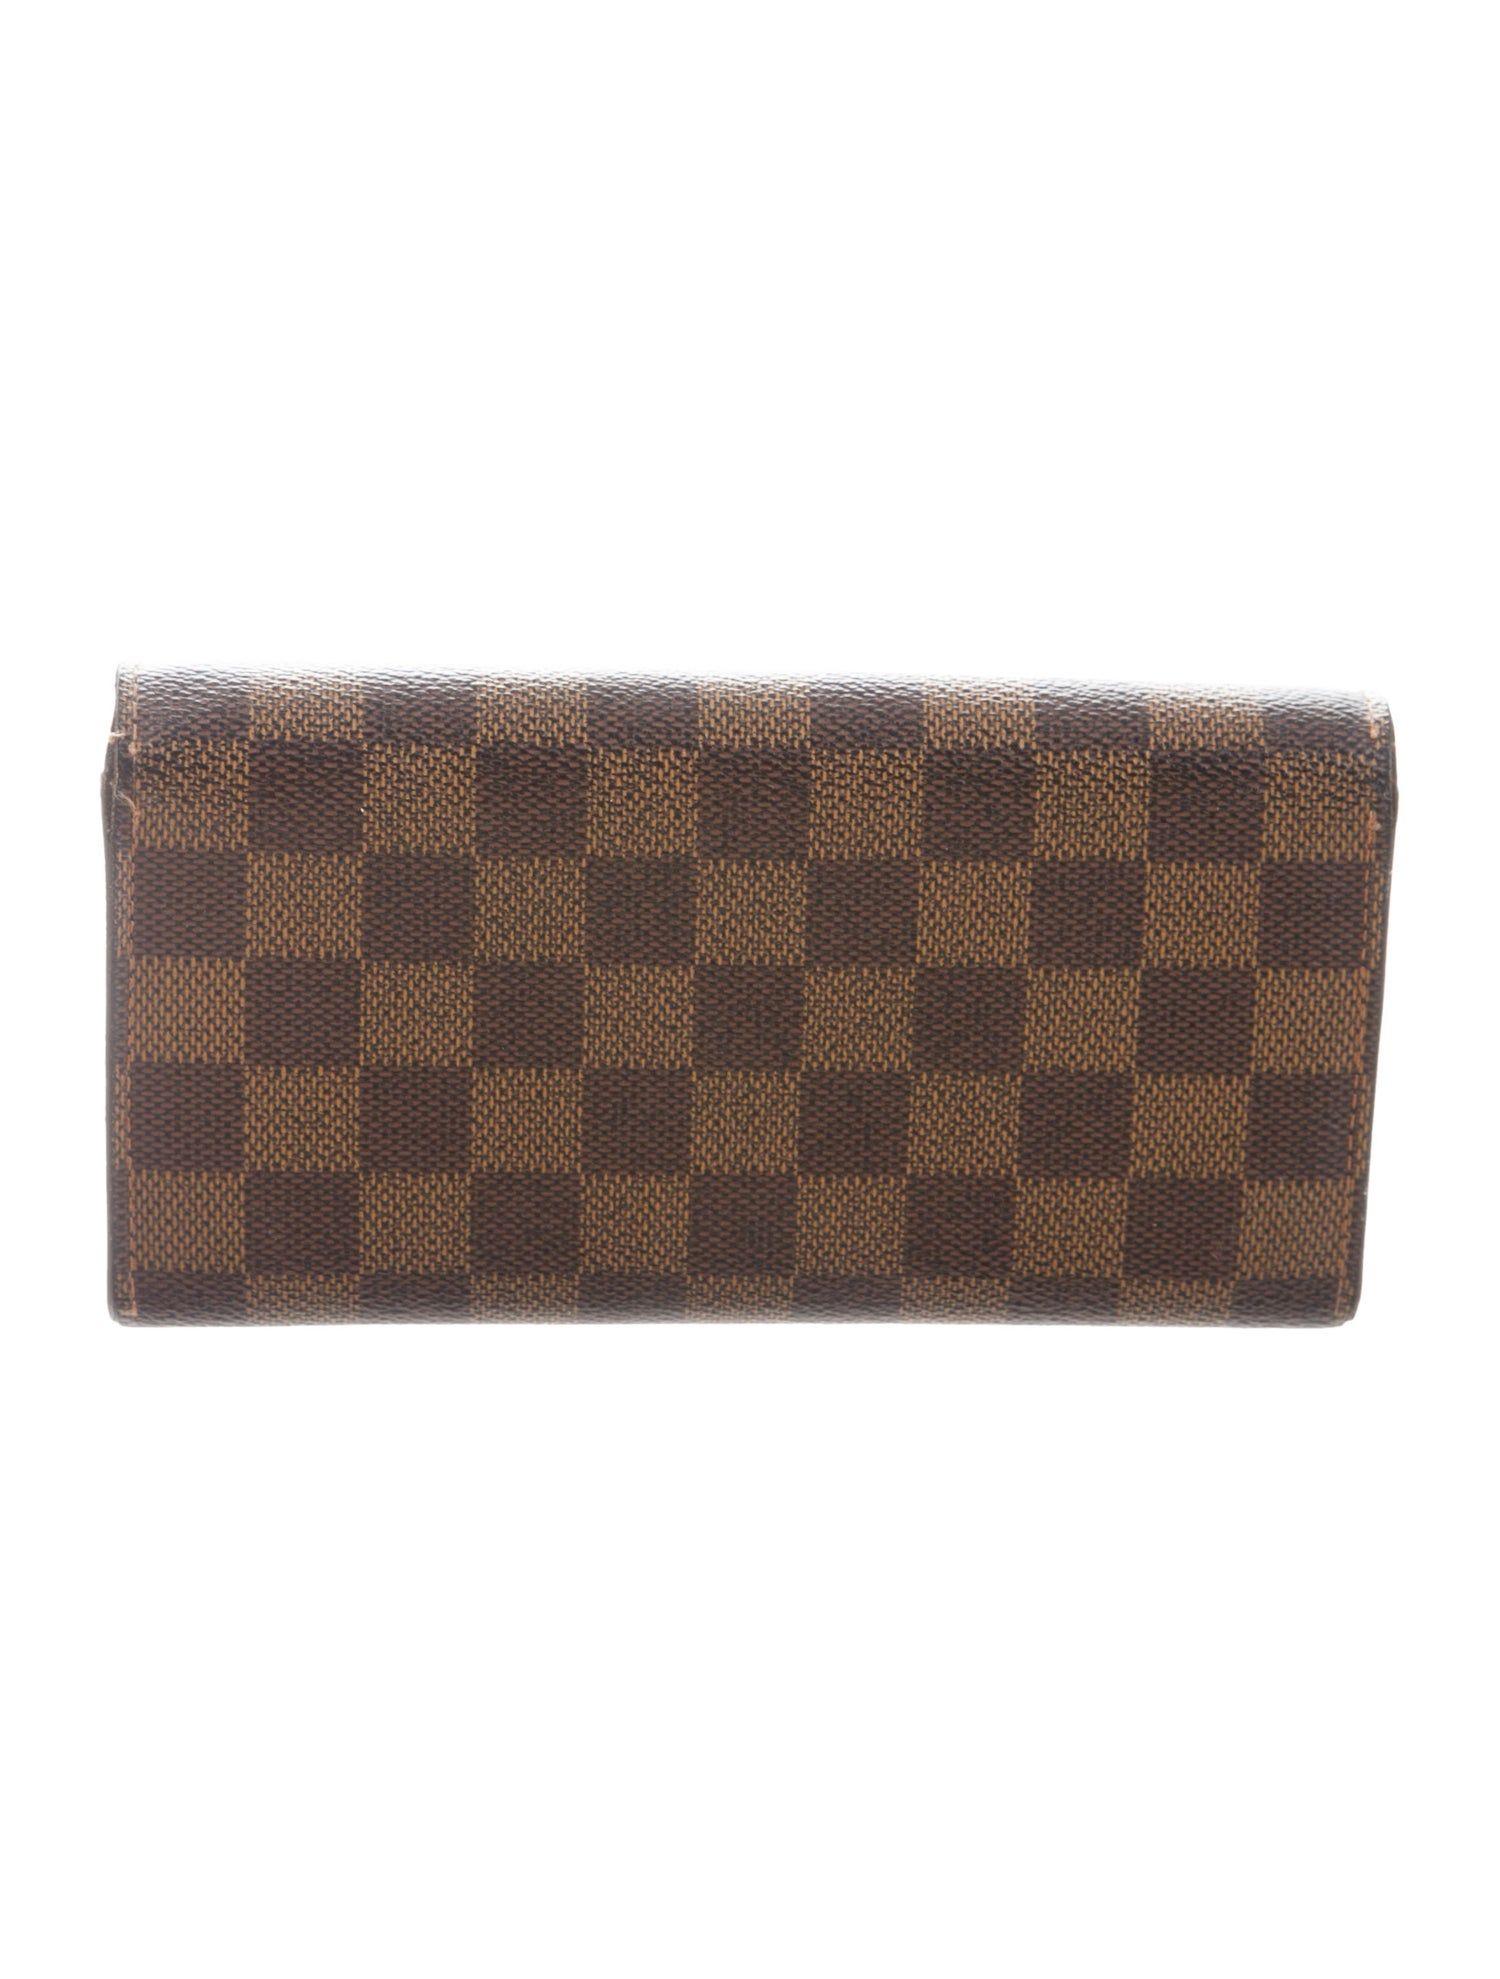 Damier Ebene International Wallet Pattern Louis Vuitton Louis Vuitton Damier